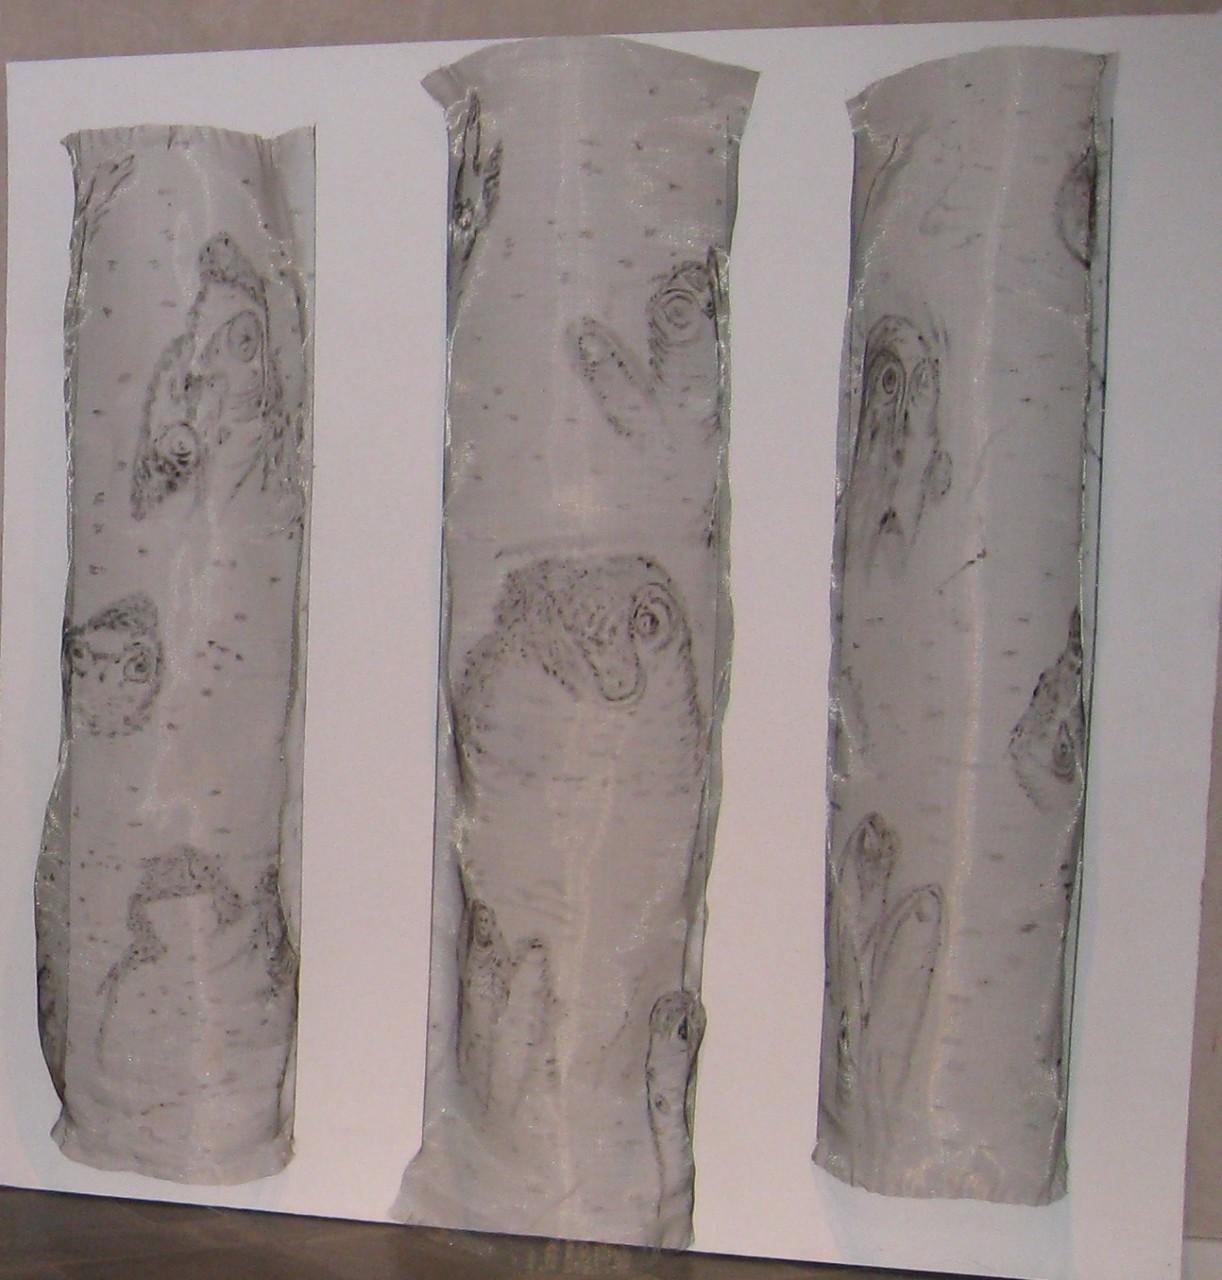 4-Basoaren Irudiak-Imagenes en el Bosque